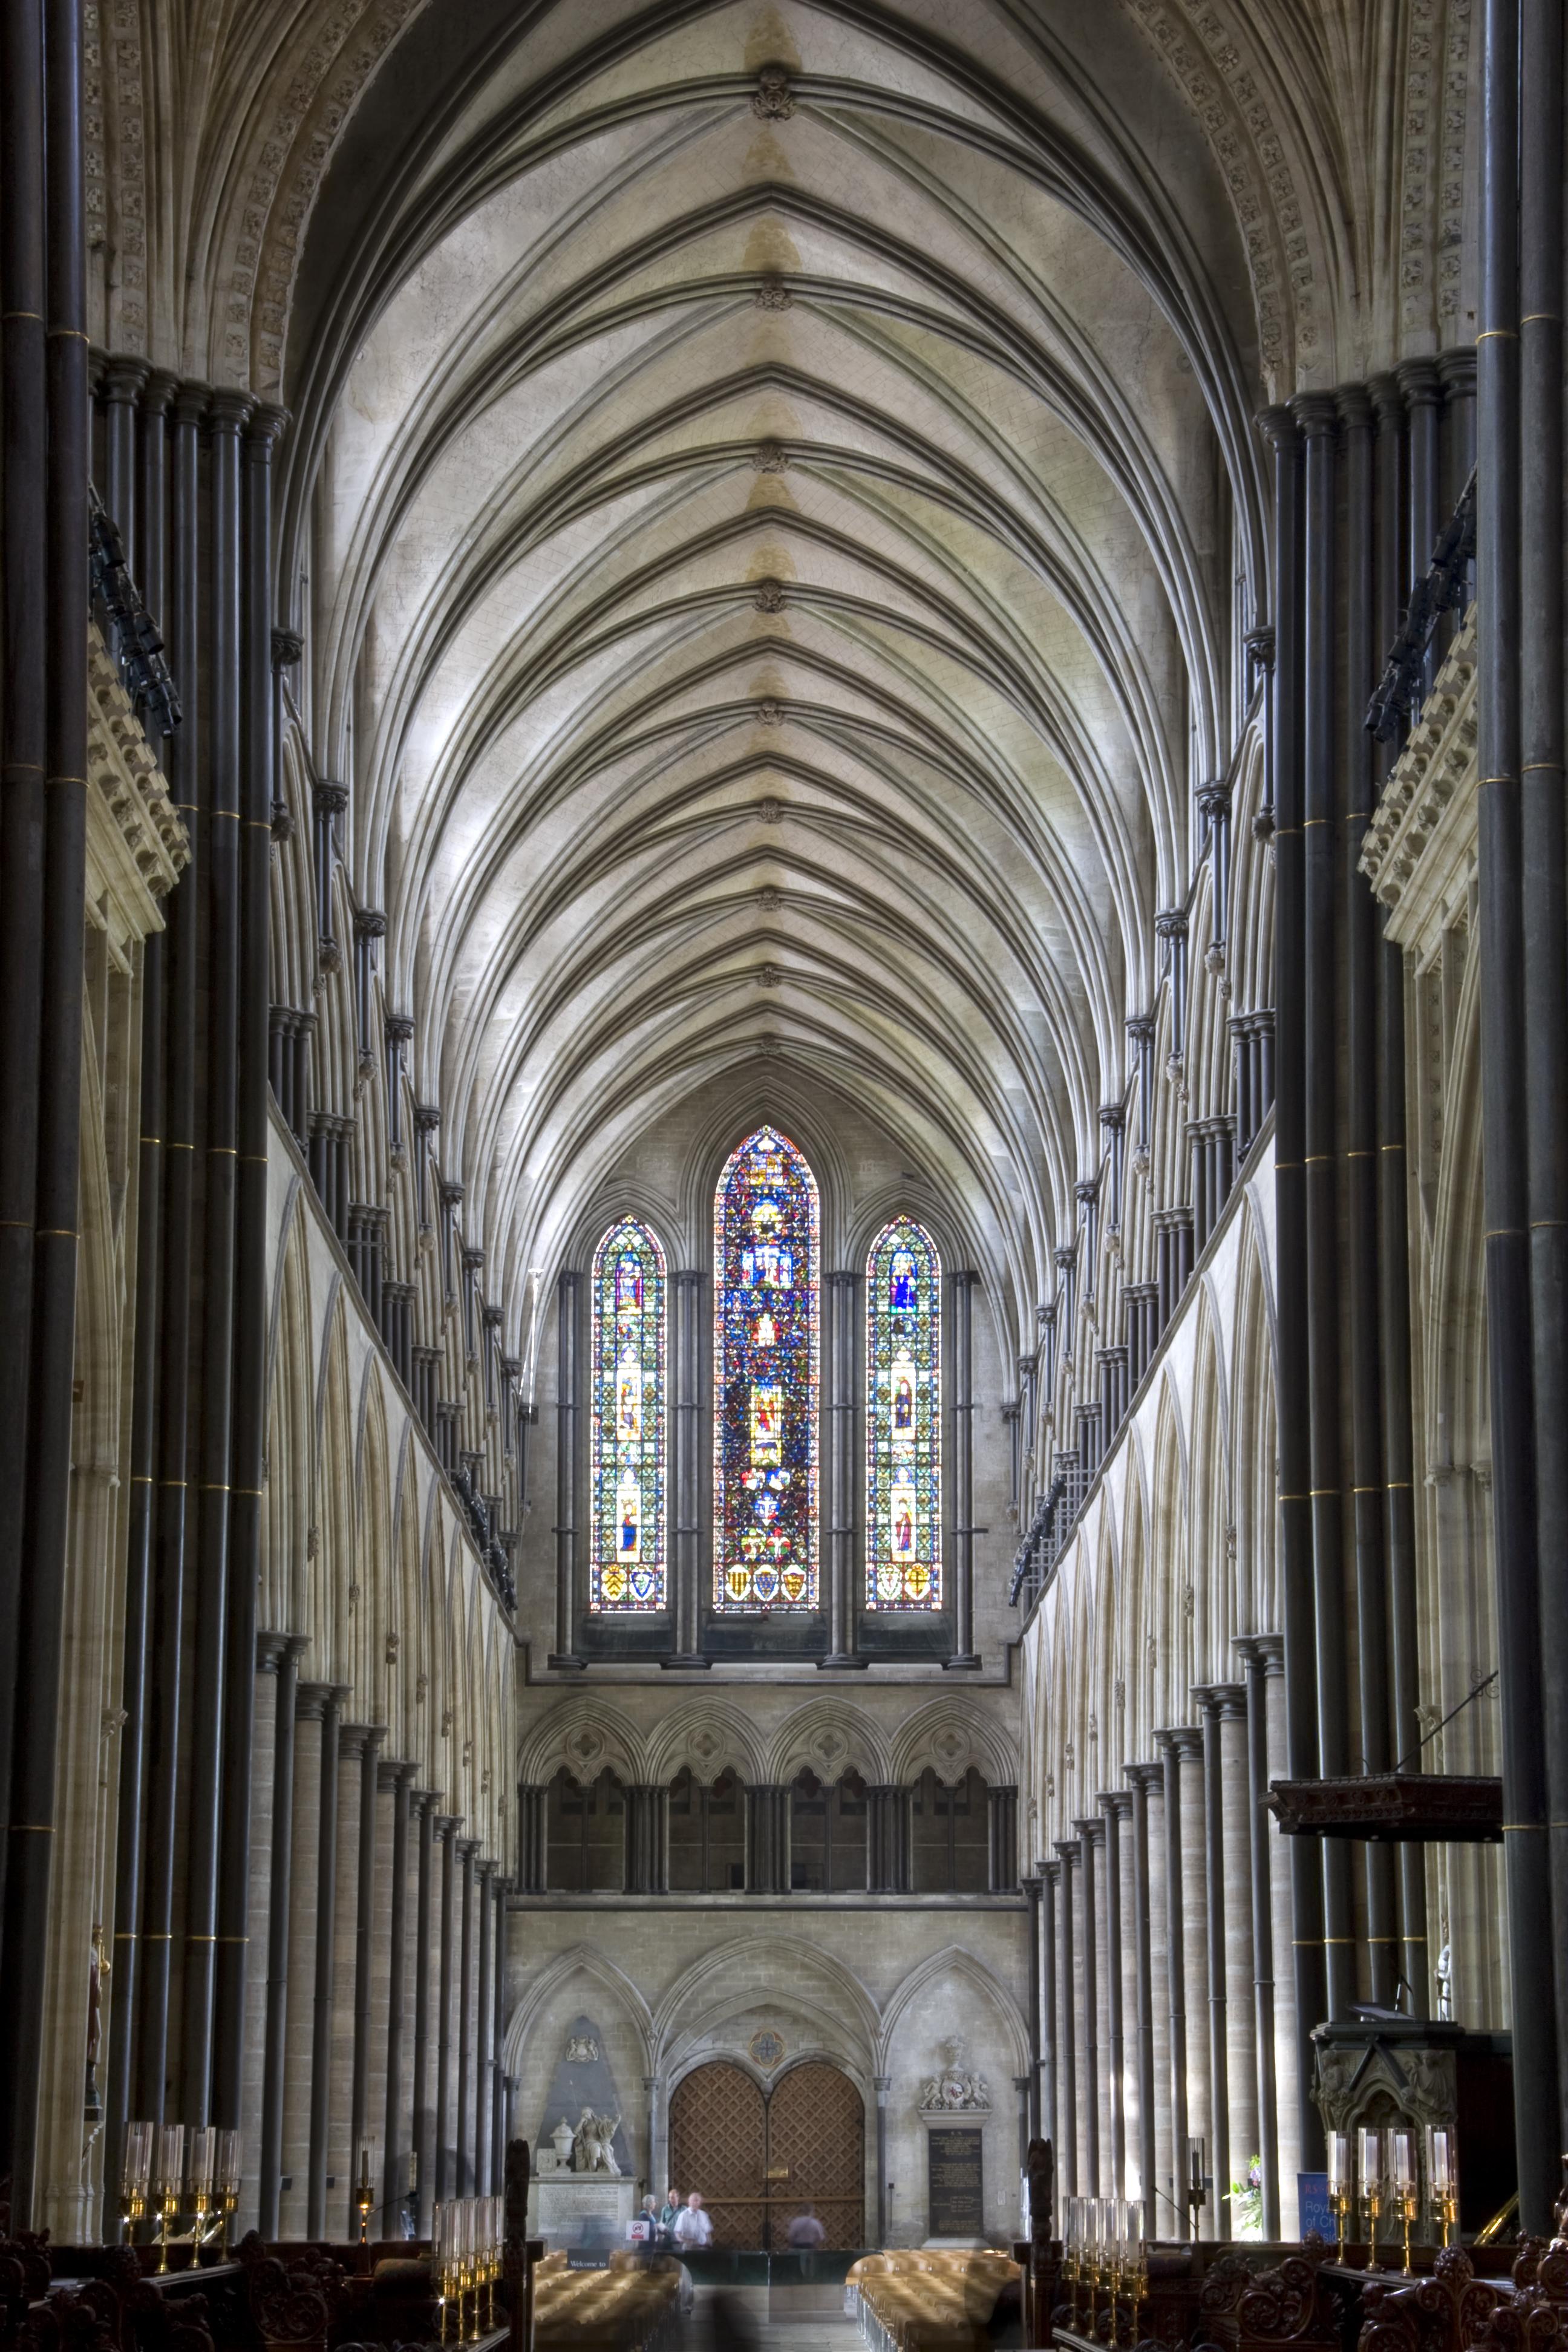 File:Salisbury Cathedral Nave looking west.jpg - Wikipedia